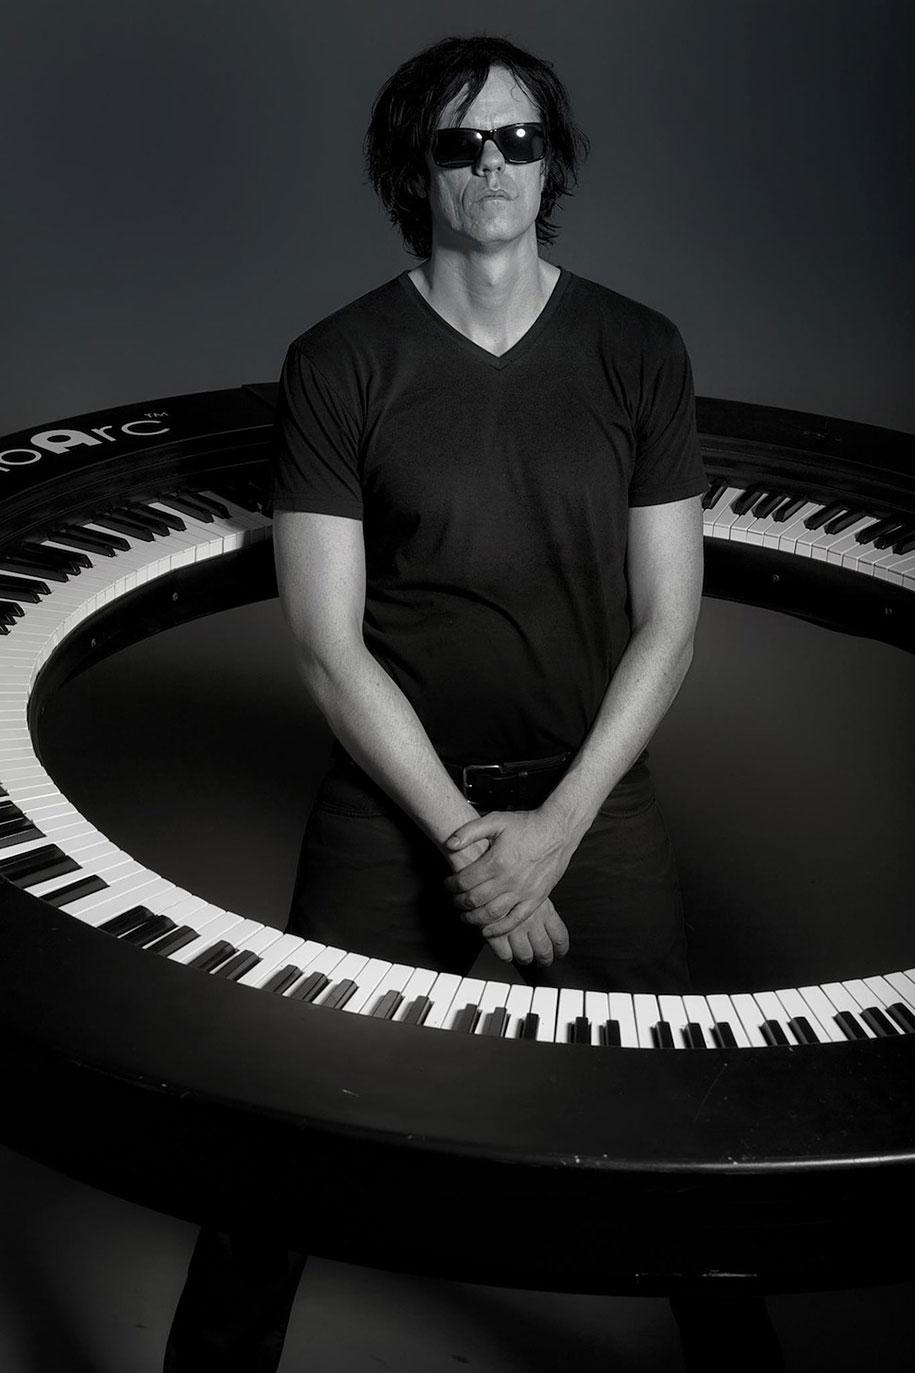 piano-arc-circular-keyboard-brockettship-brockett-parsons-3